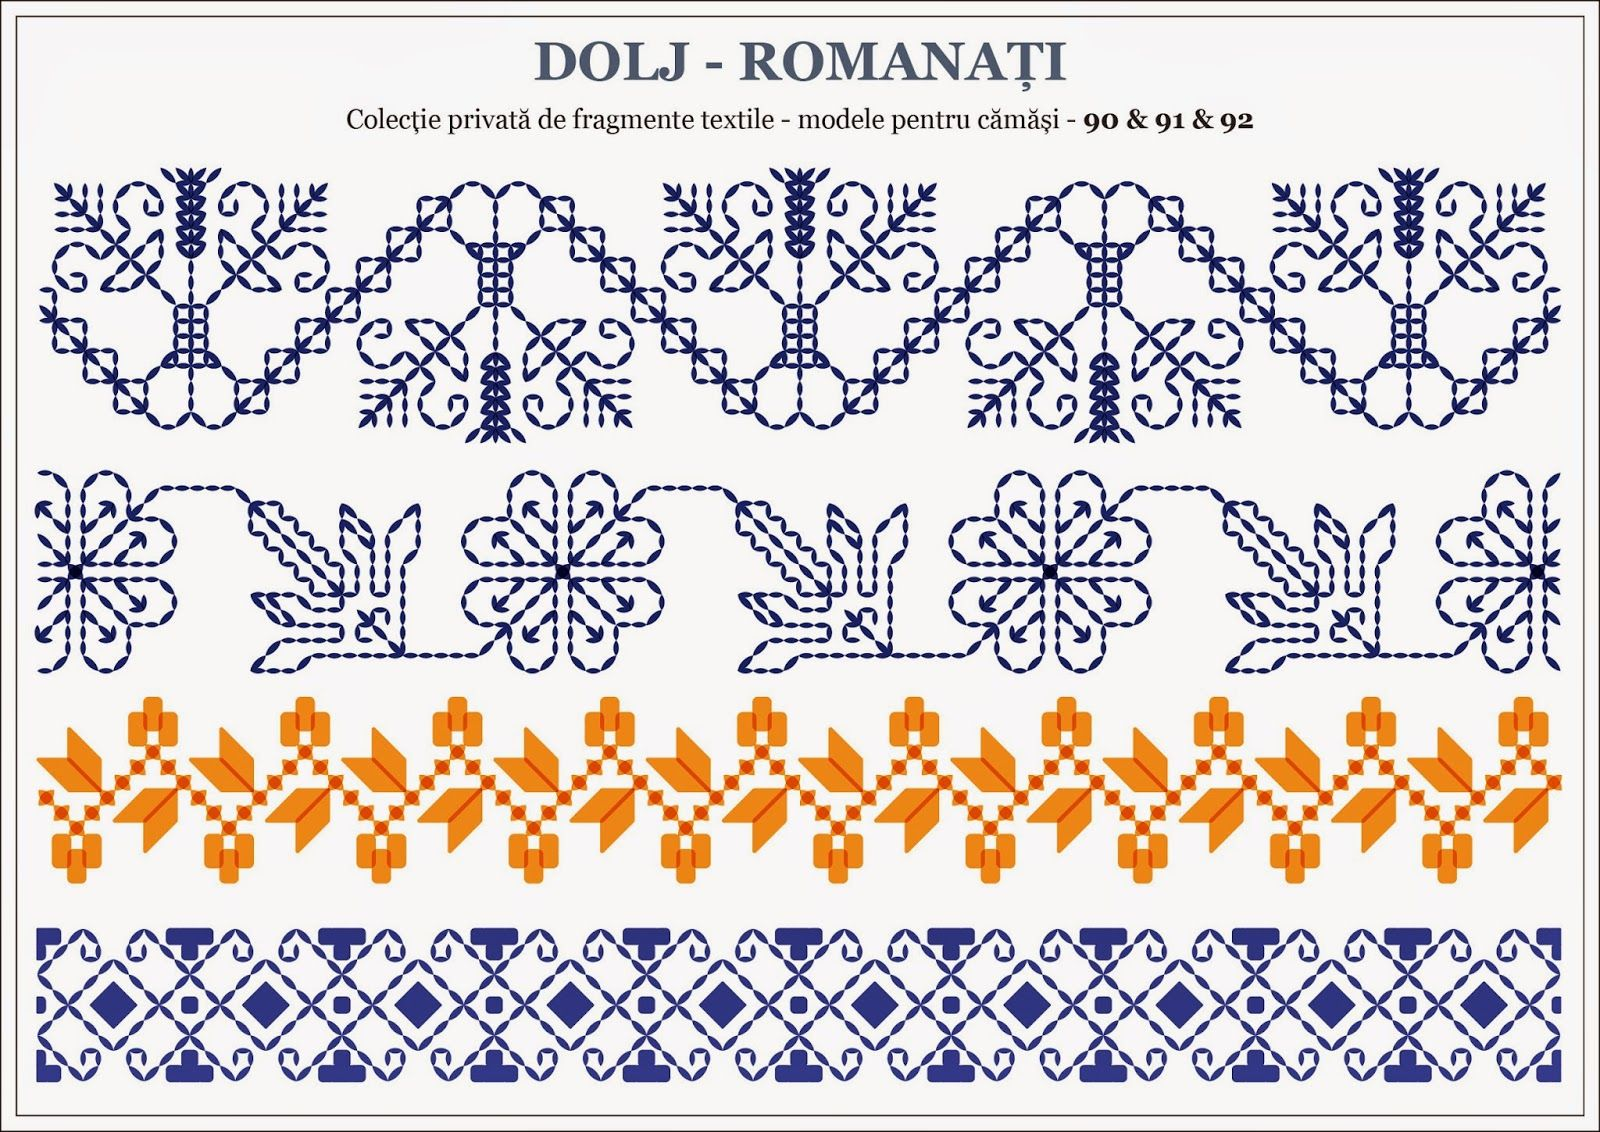 Romanian Traditional Motifs Oltenia Dolj Romanati Semne Cusute Traditional Blackwork